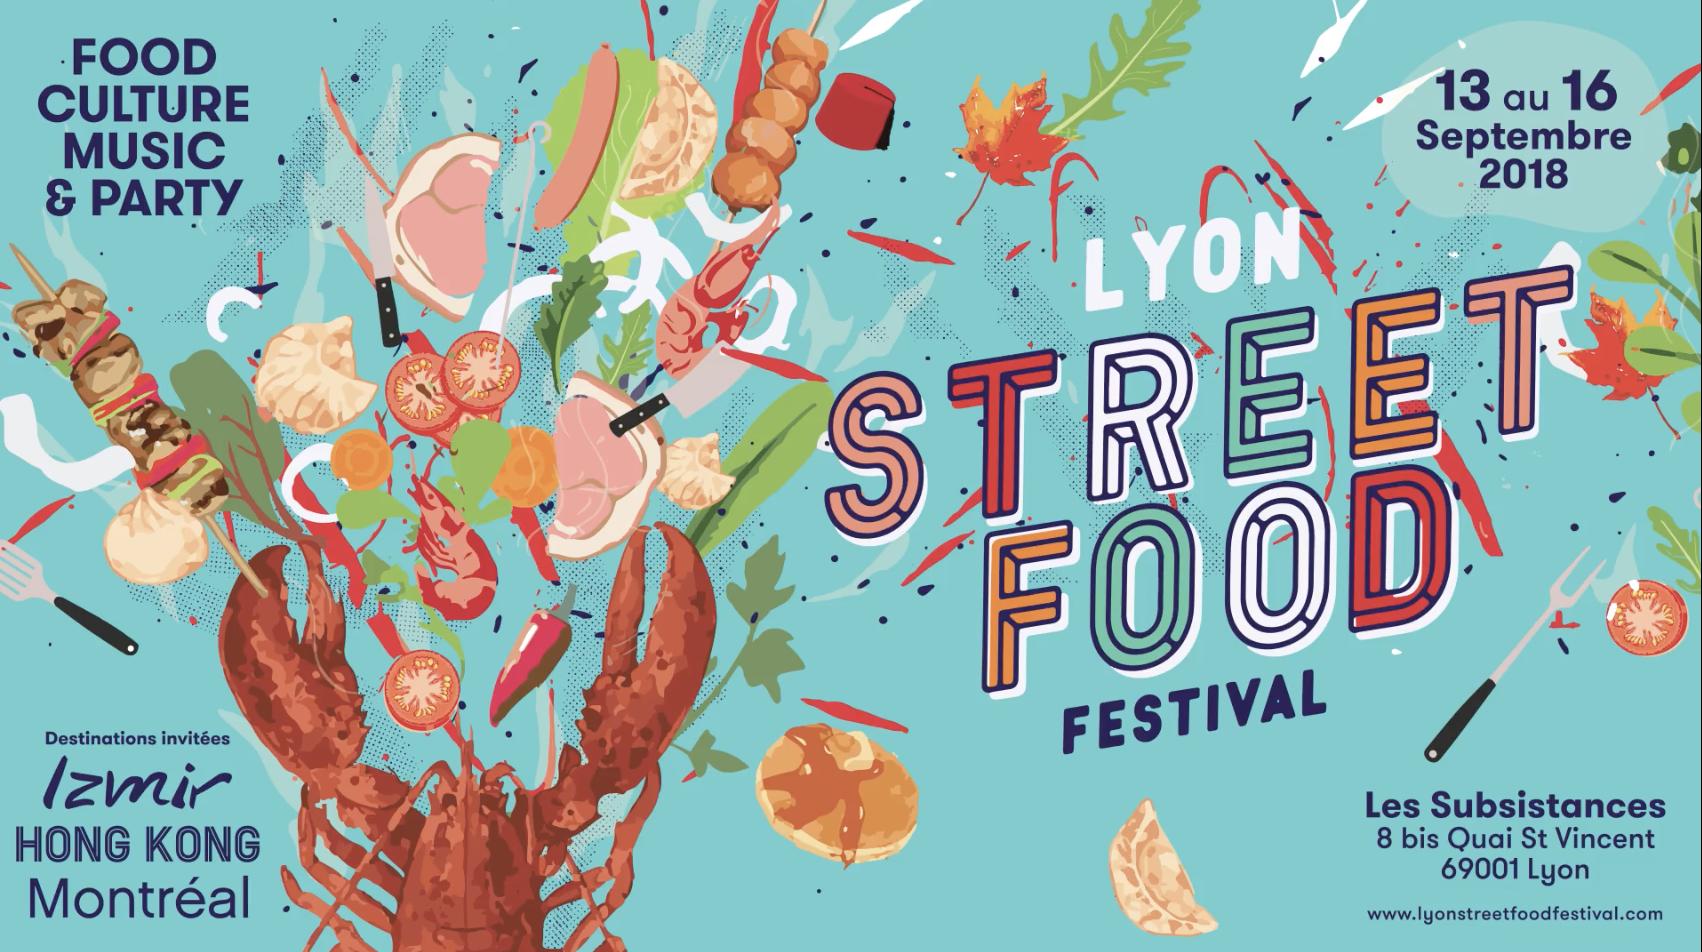 lyon street food festival 2018